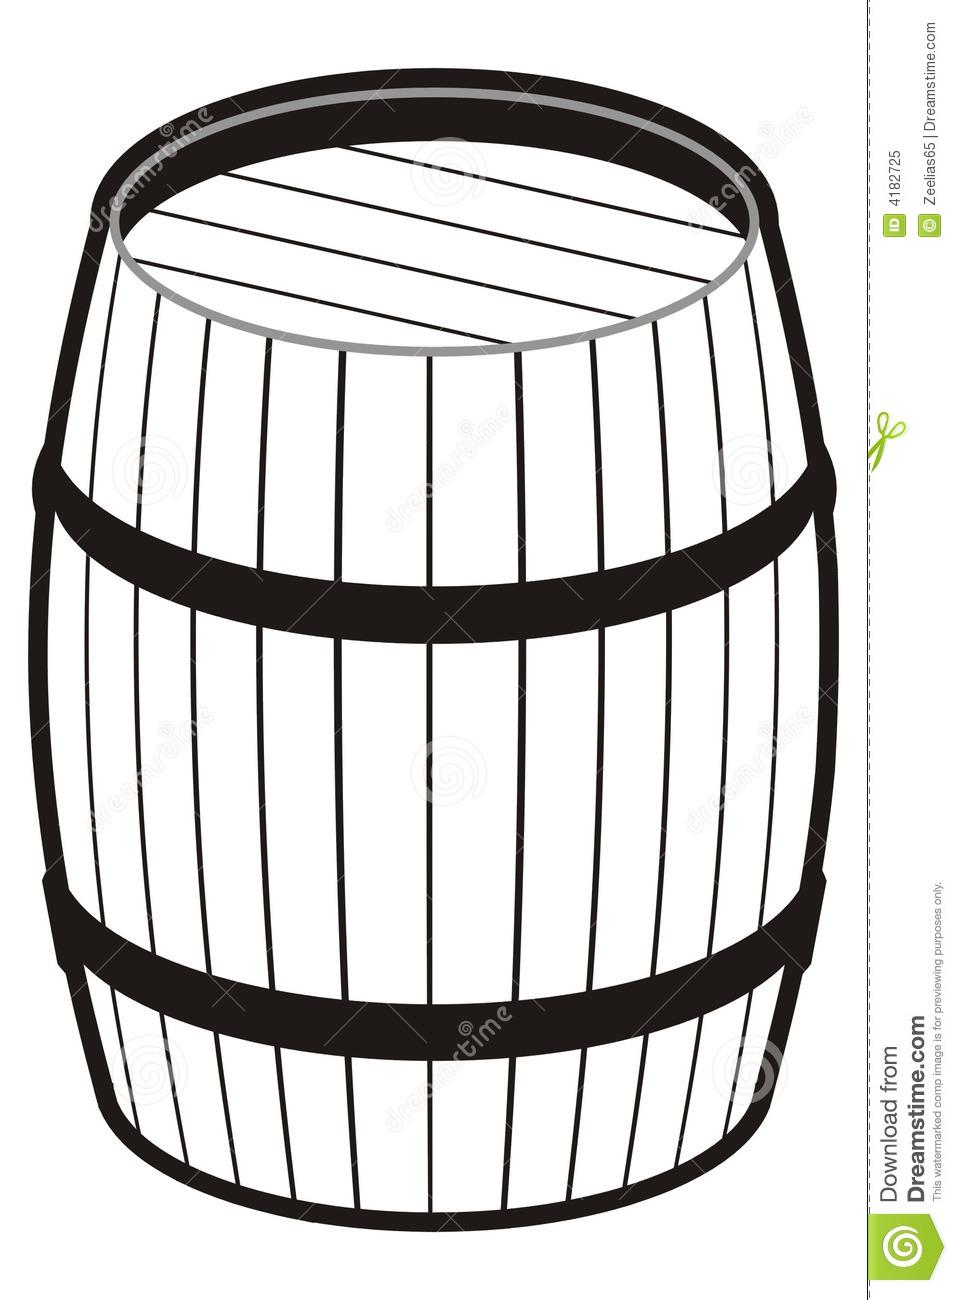 Barrel Royalty Free Stock Photo.